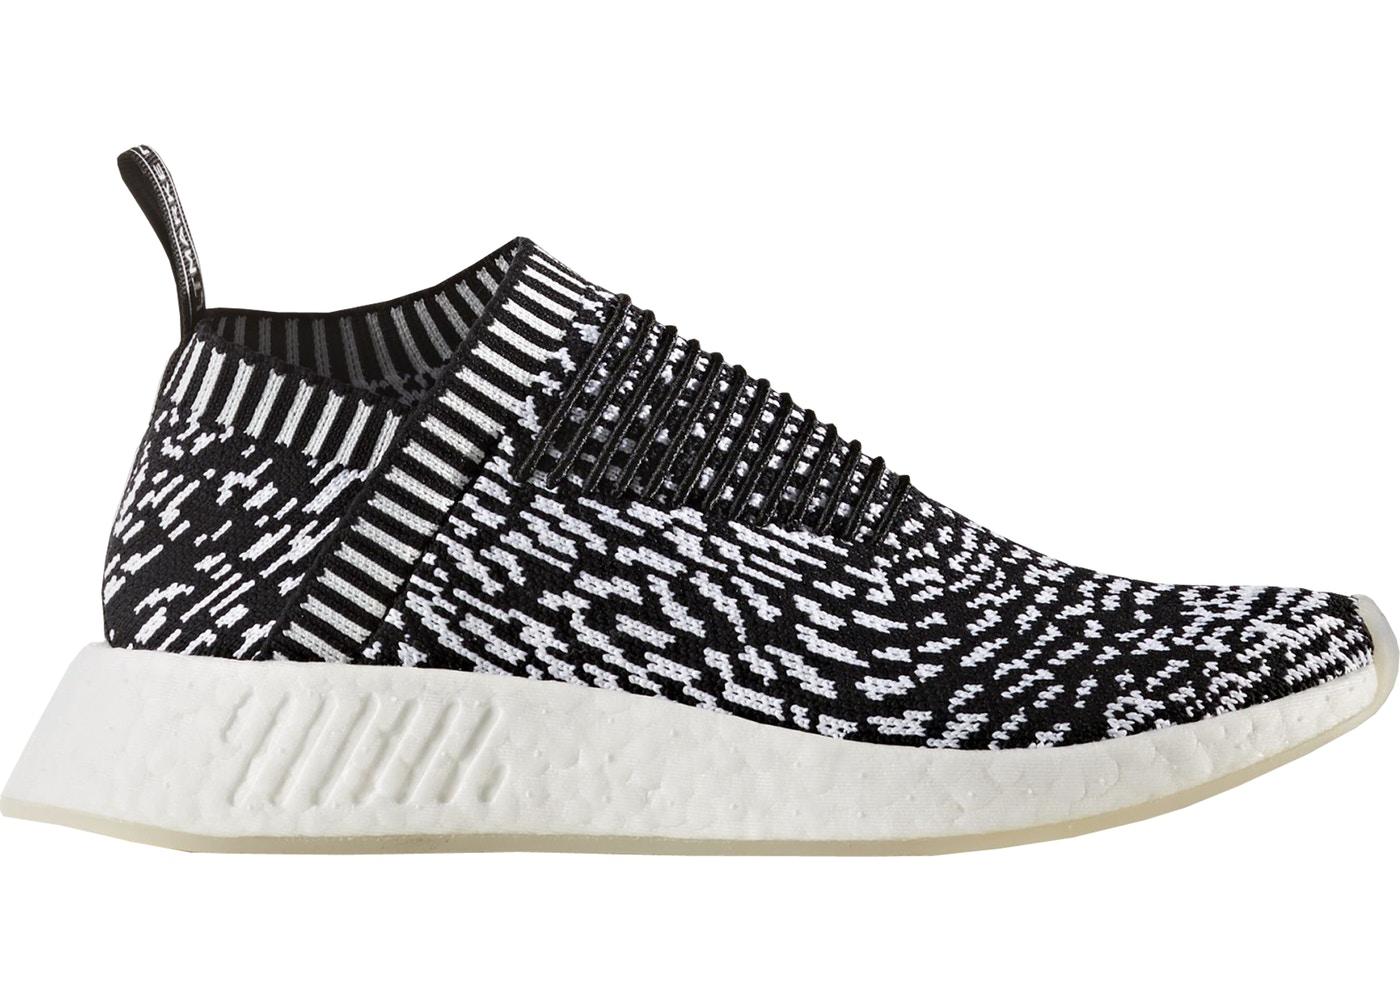 Adidas adidas NMD Cs2 Sneaker In Black Shashiko Knit in 2019